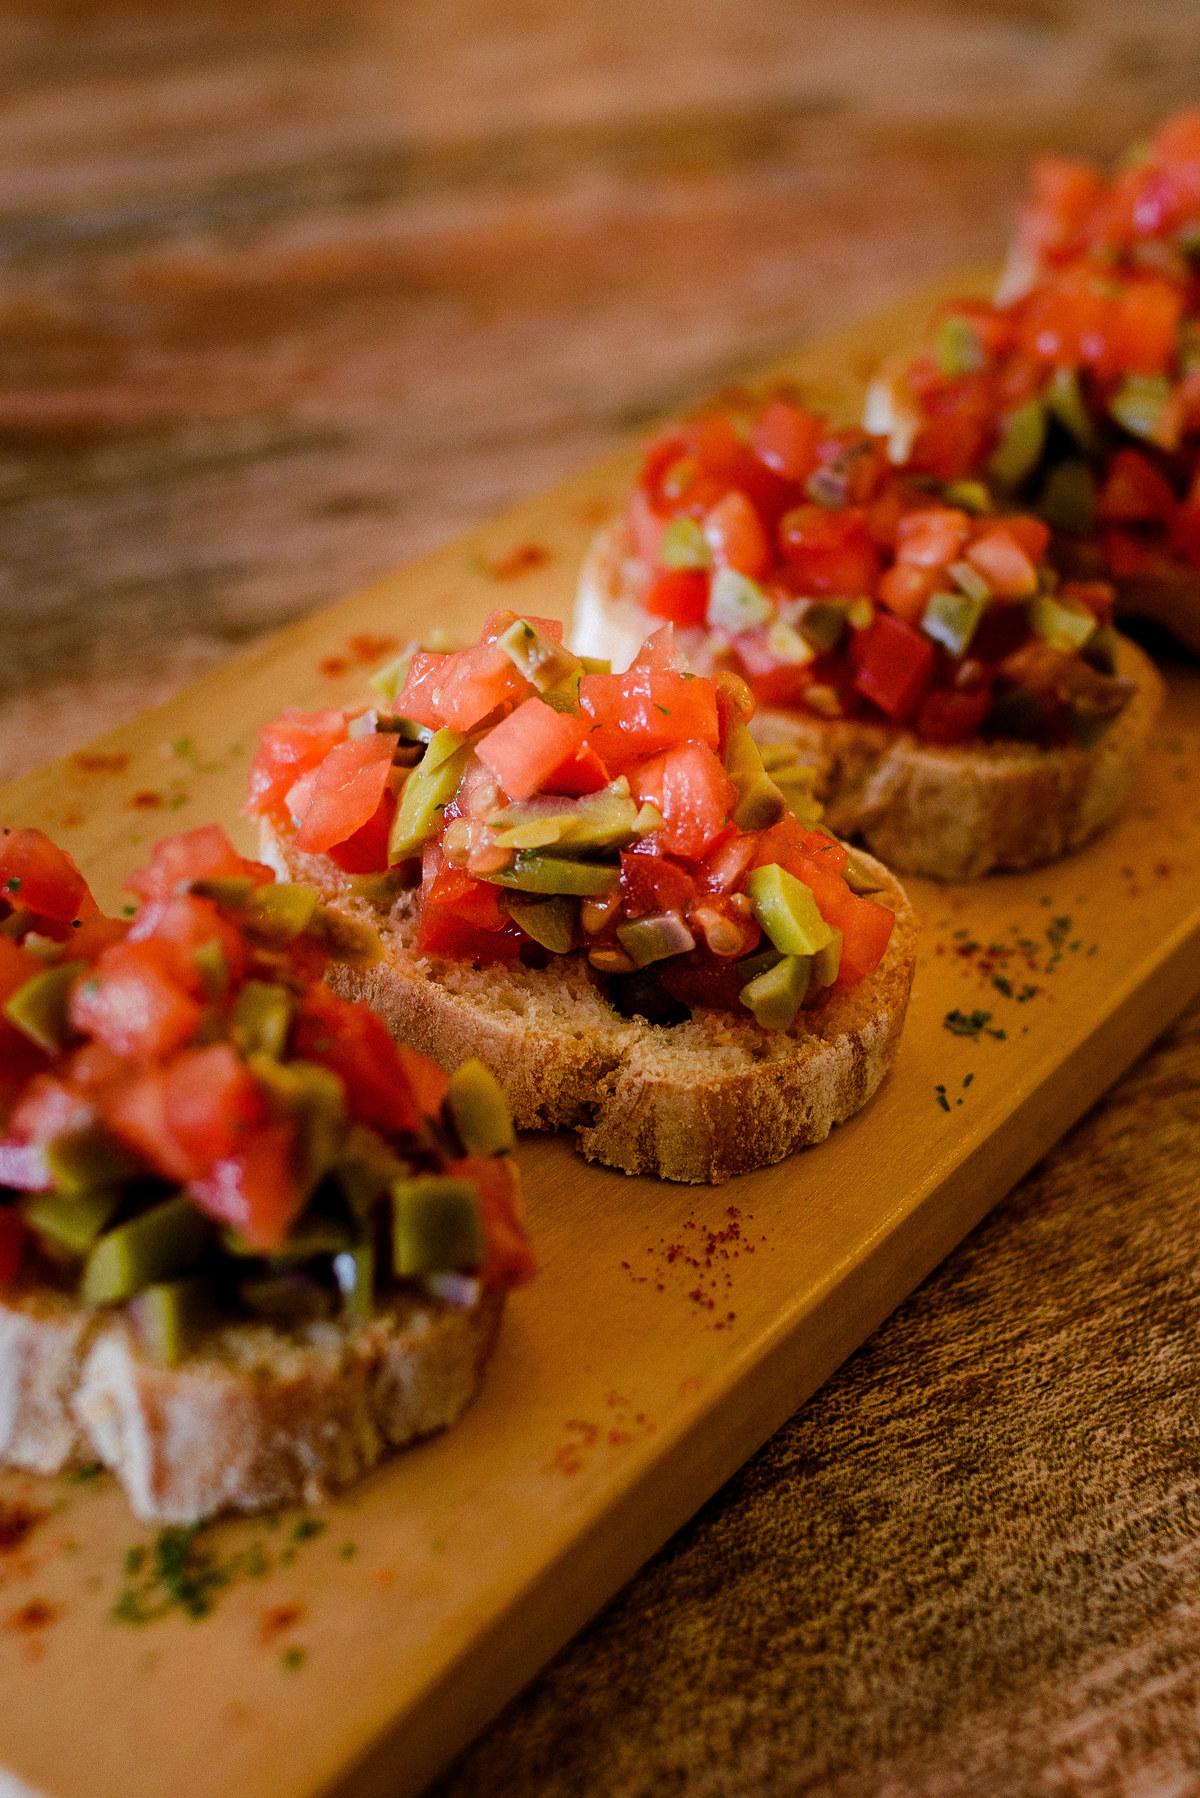 Imagem capa - Food photos and the dilemma of being niched on social media por Joanna Pantigoso